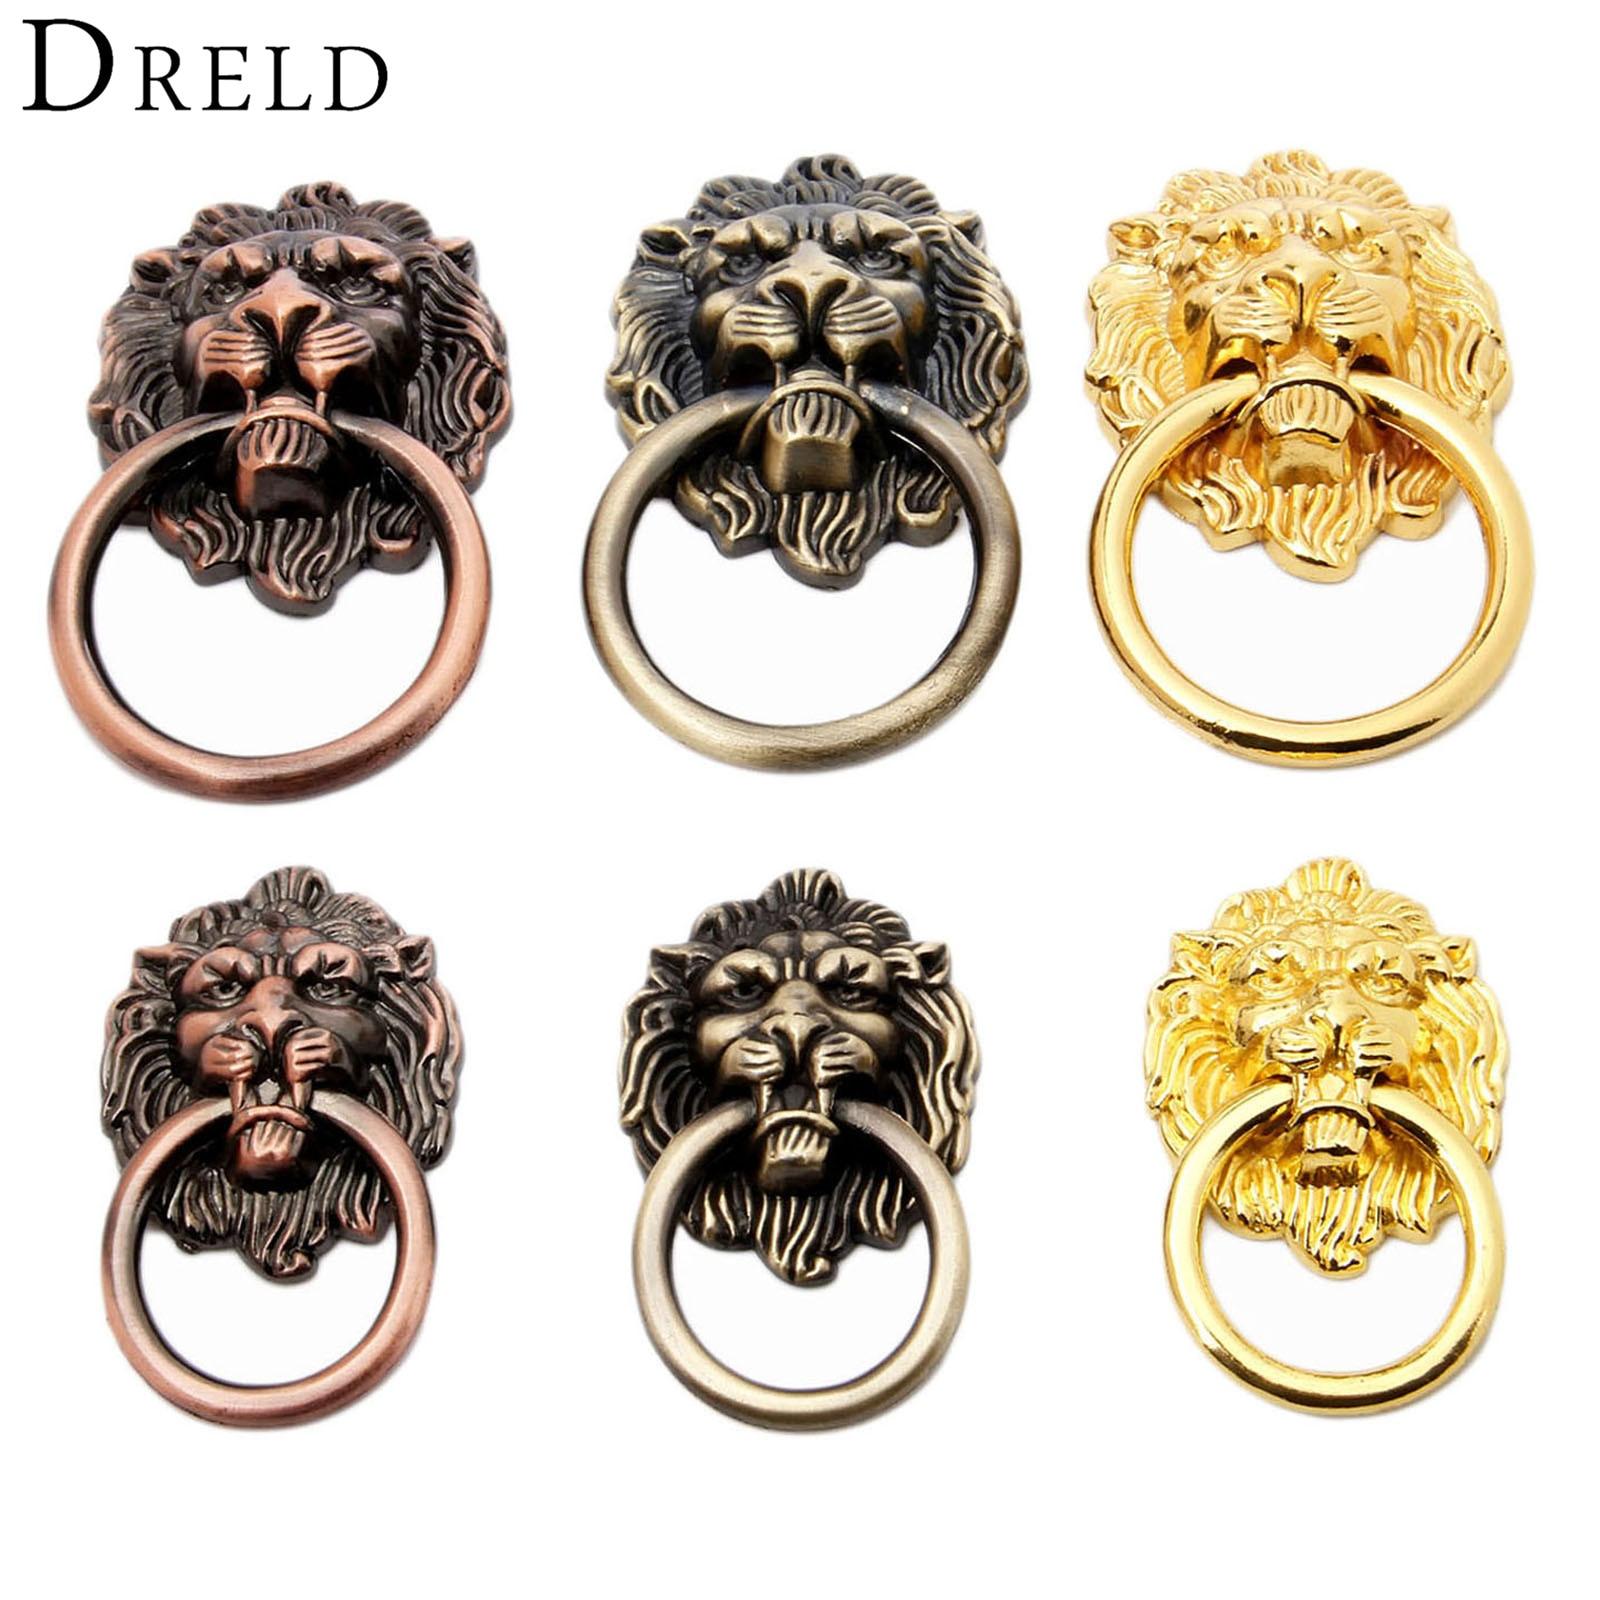 DRELD Antique Furniture Handles Vintage Lion Head Cabinet Knobs and Handles Furniture Door Cabinet Drawer Pull Handle Knob Ring